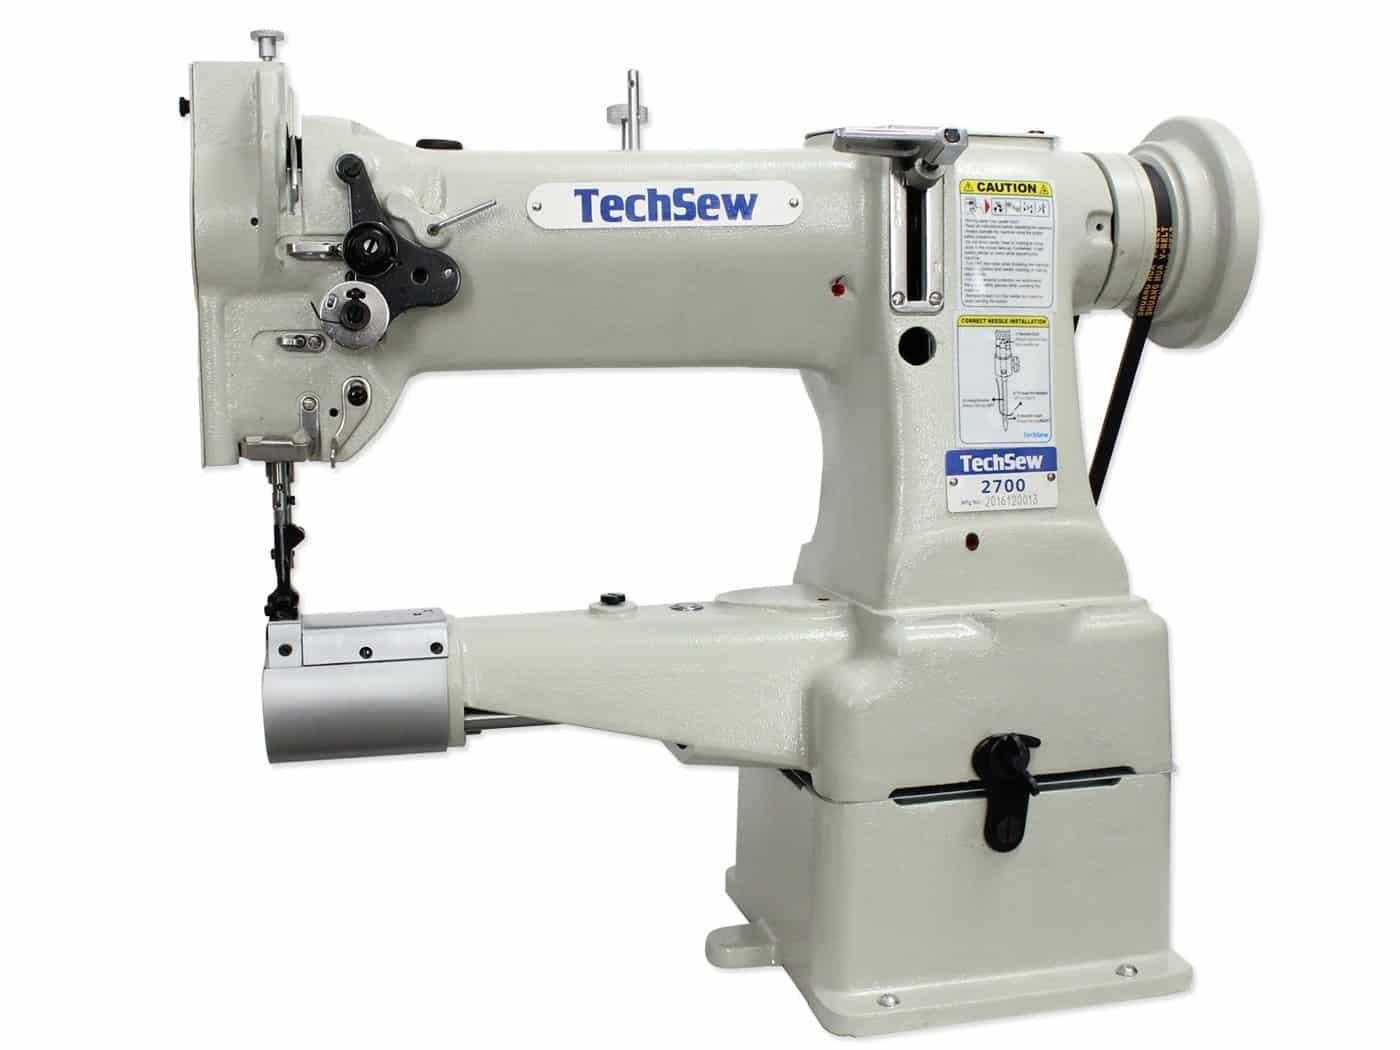 TechSew 2700 Leather Walking Foot Industrial Sewing ...